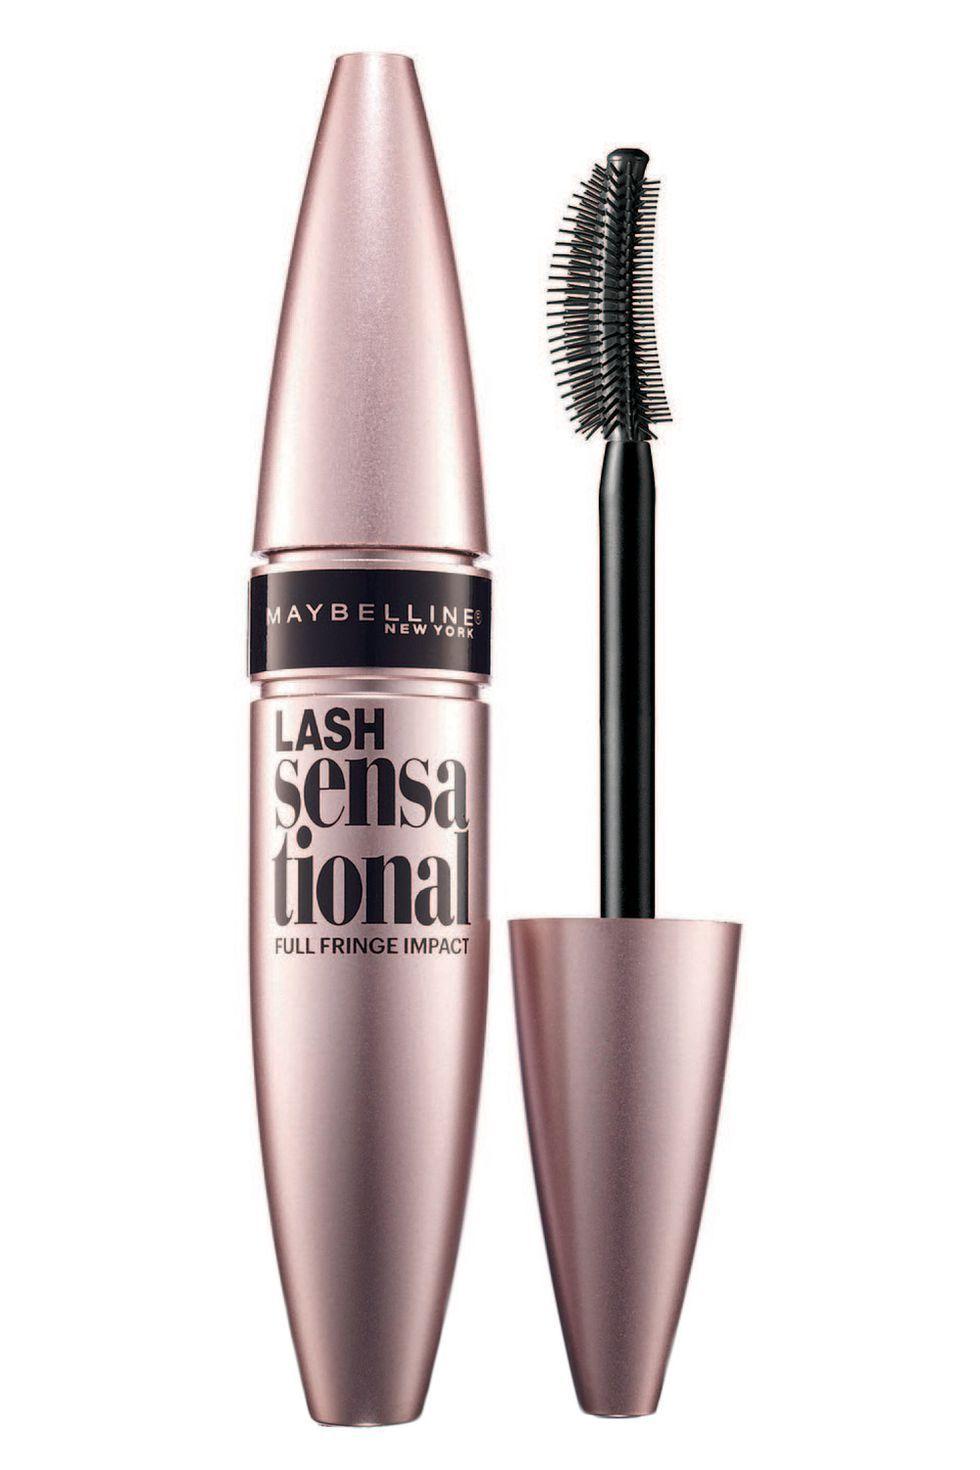 37343818b8e 10 Best Mascaras for 2017 - Drugstore and Designer Mascaras for Bold  Eyelashes #MascaraTips